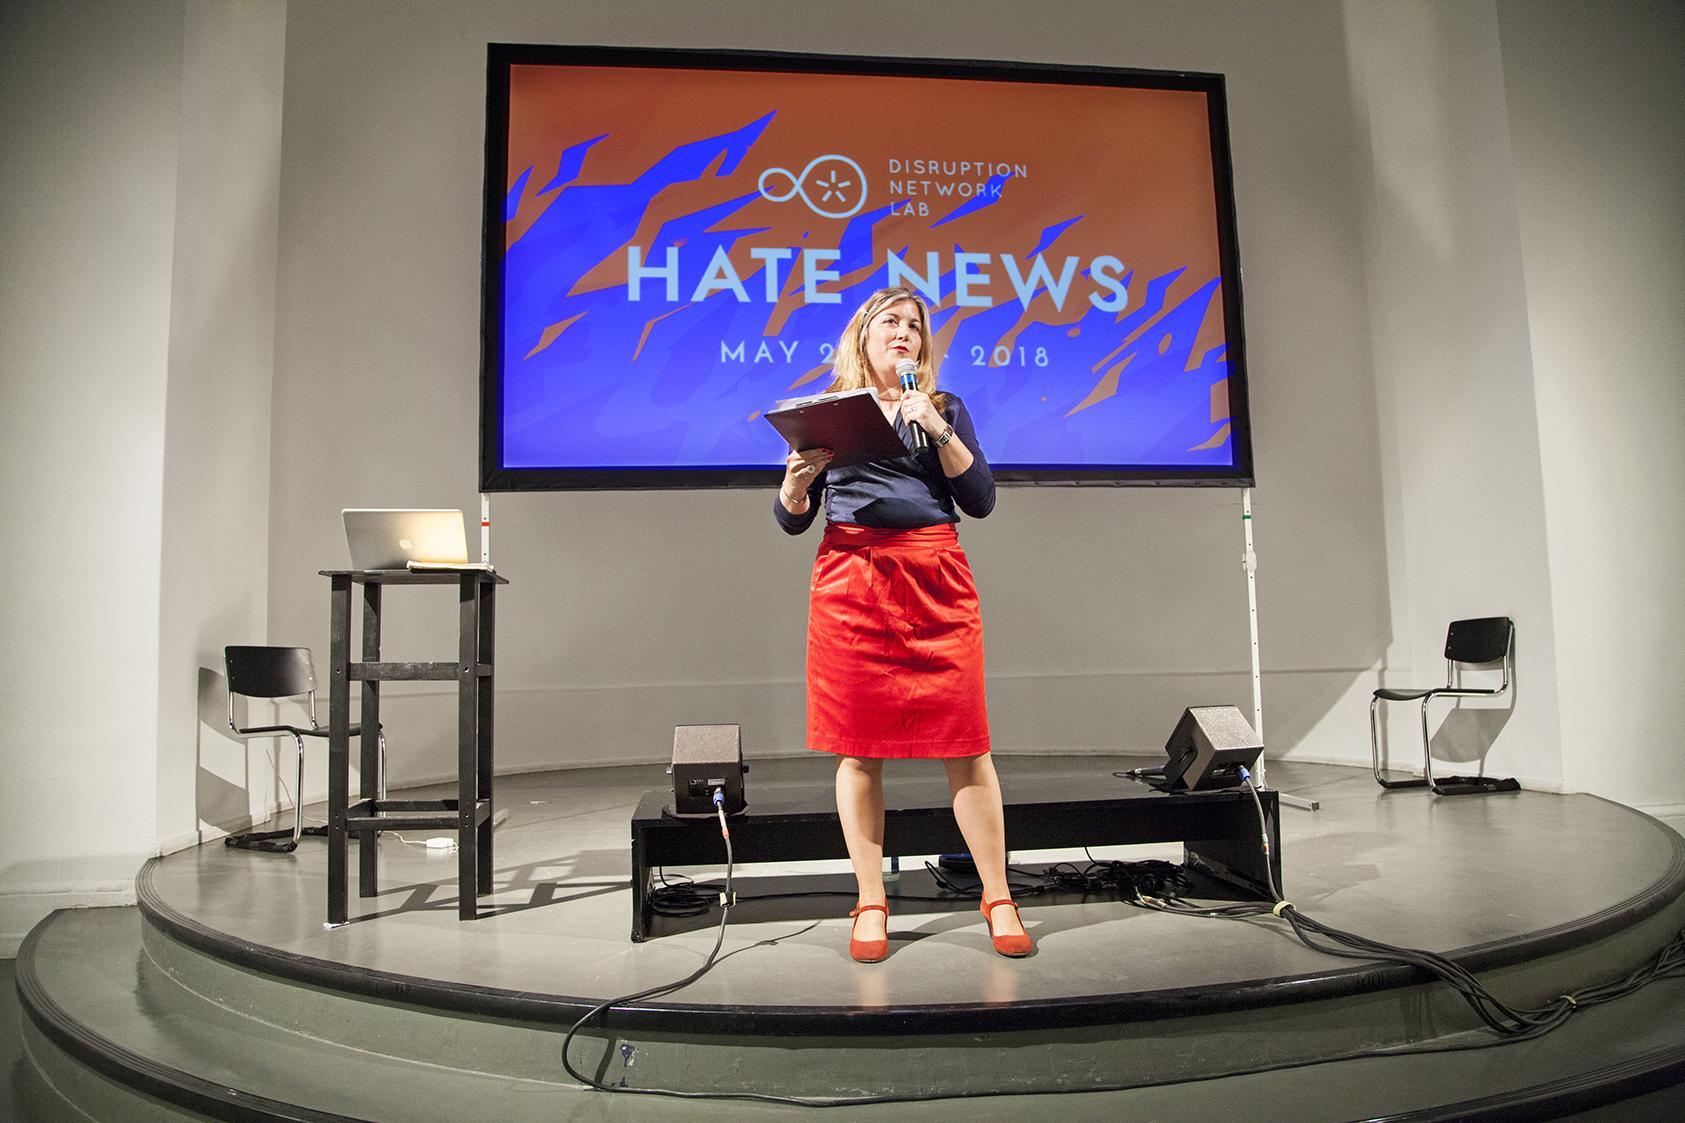 180525_hate_news_small_03.jpg